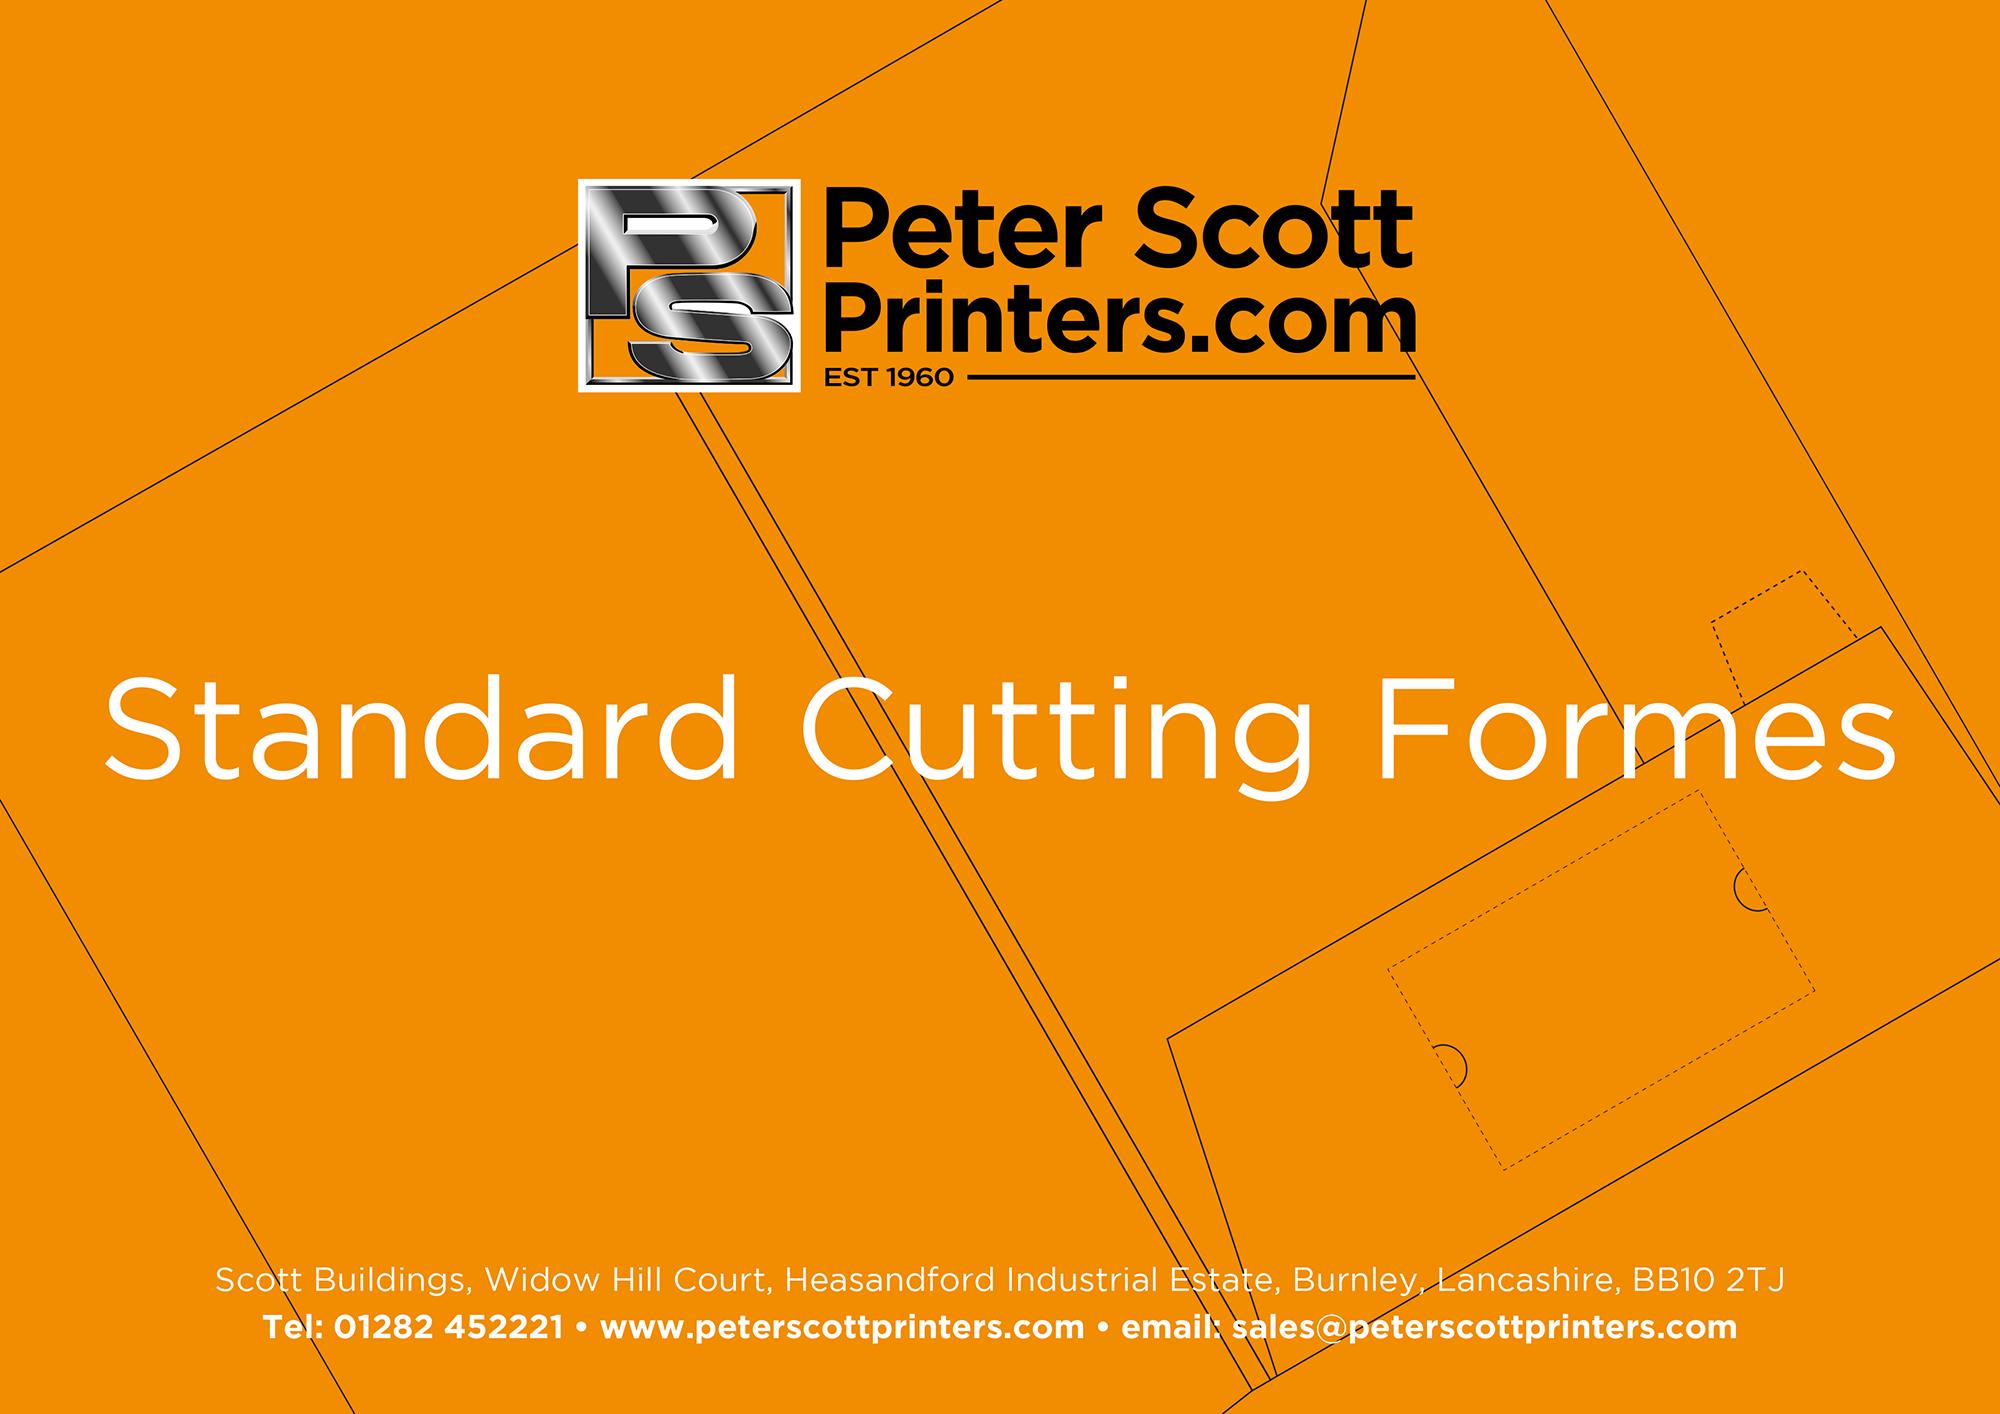 Standard Cutting Formes